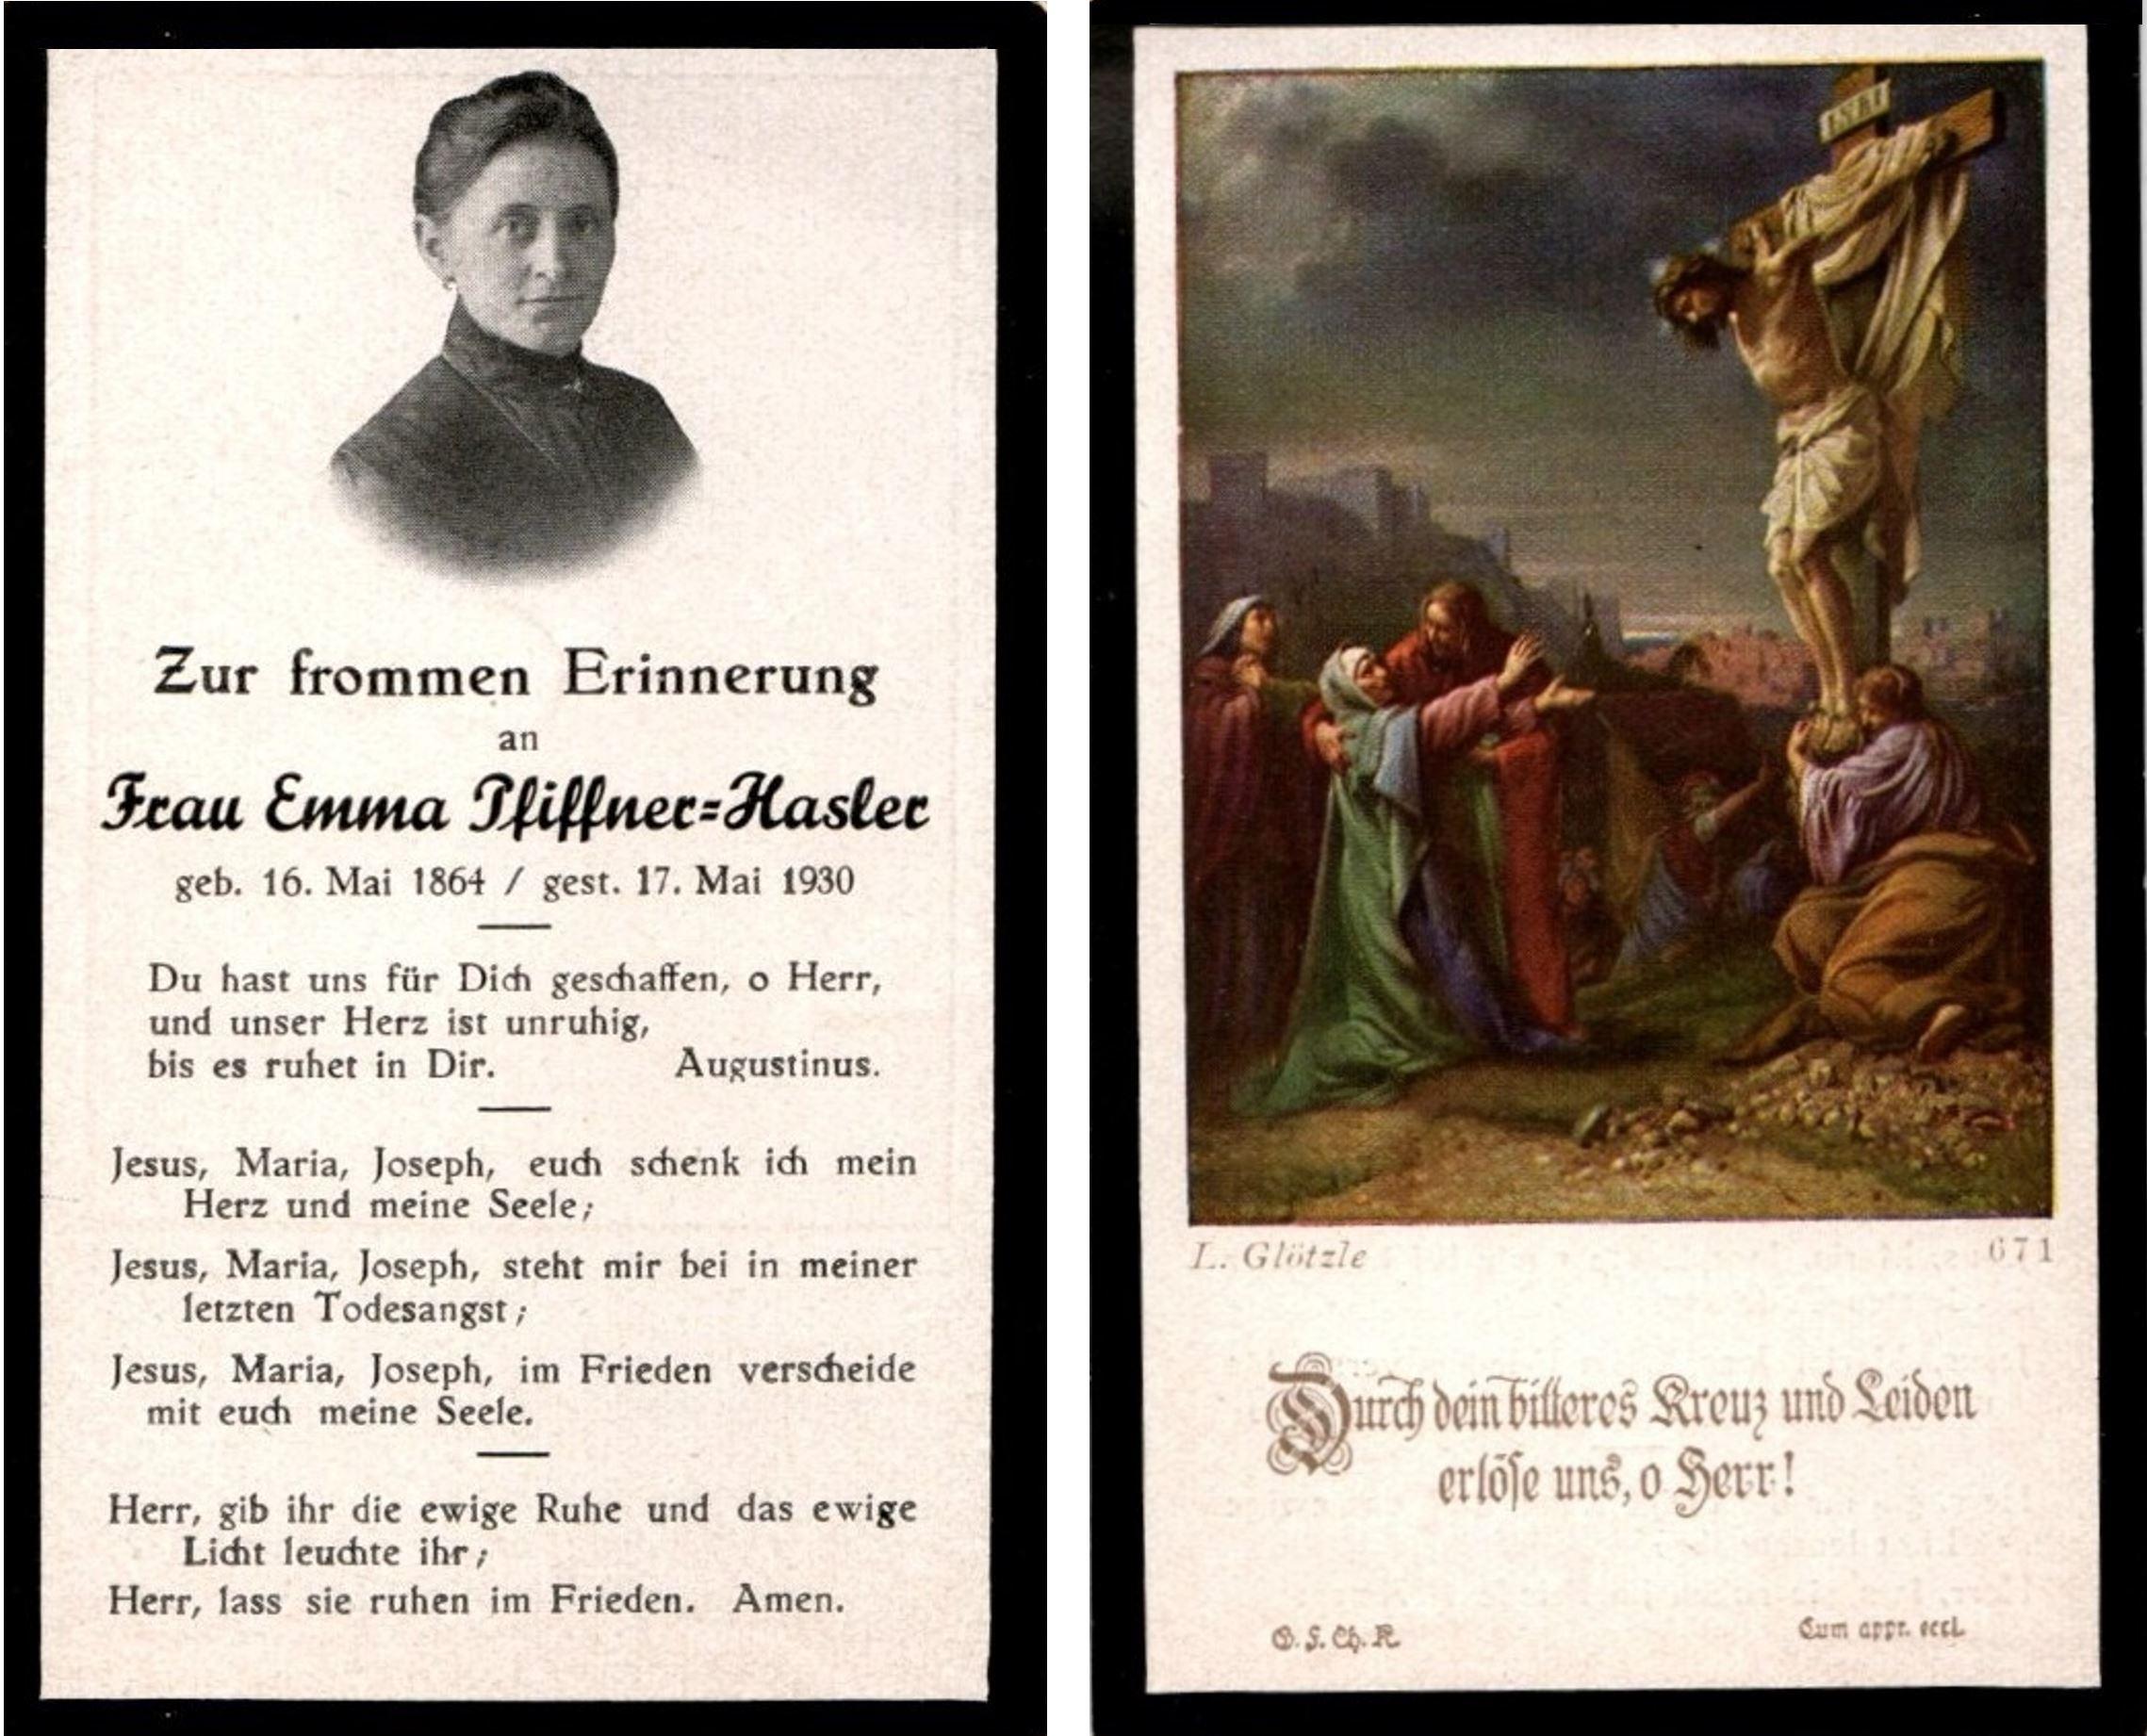 Emma Pfiffner-Hasler (1864-1930)